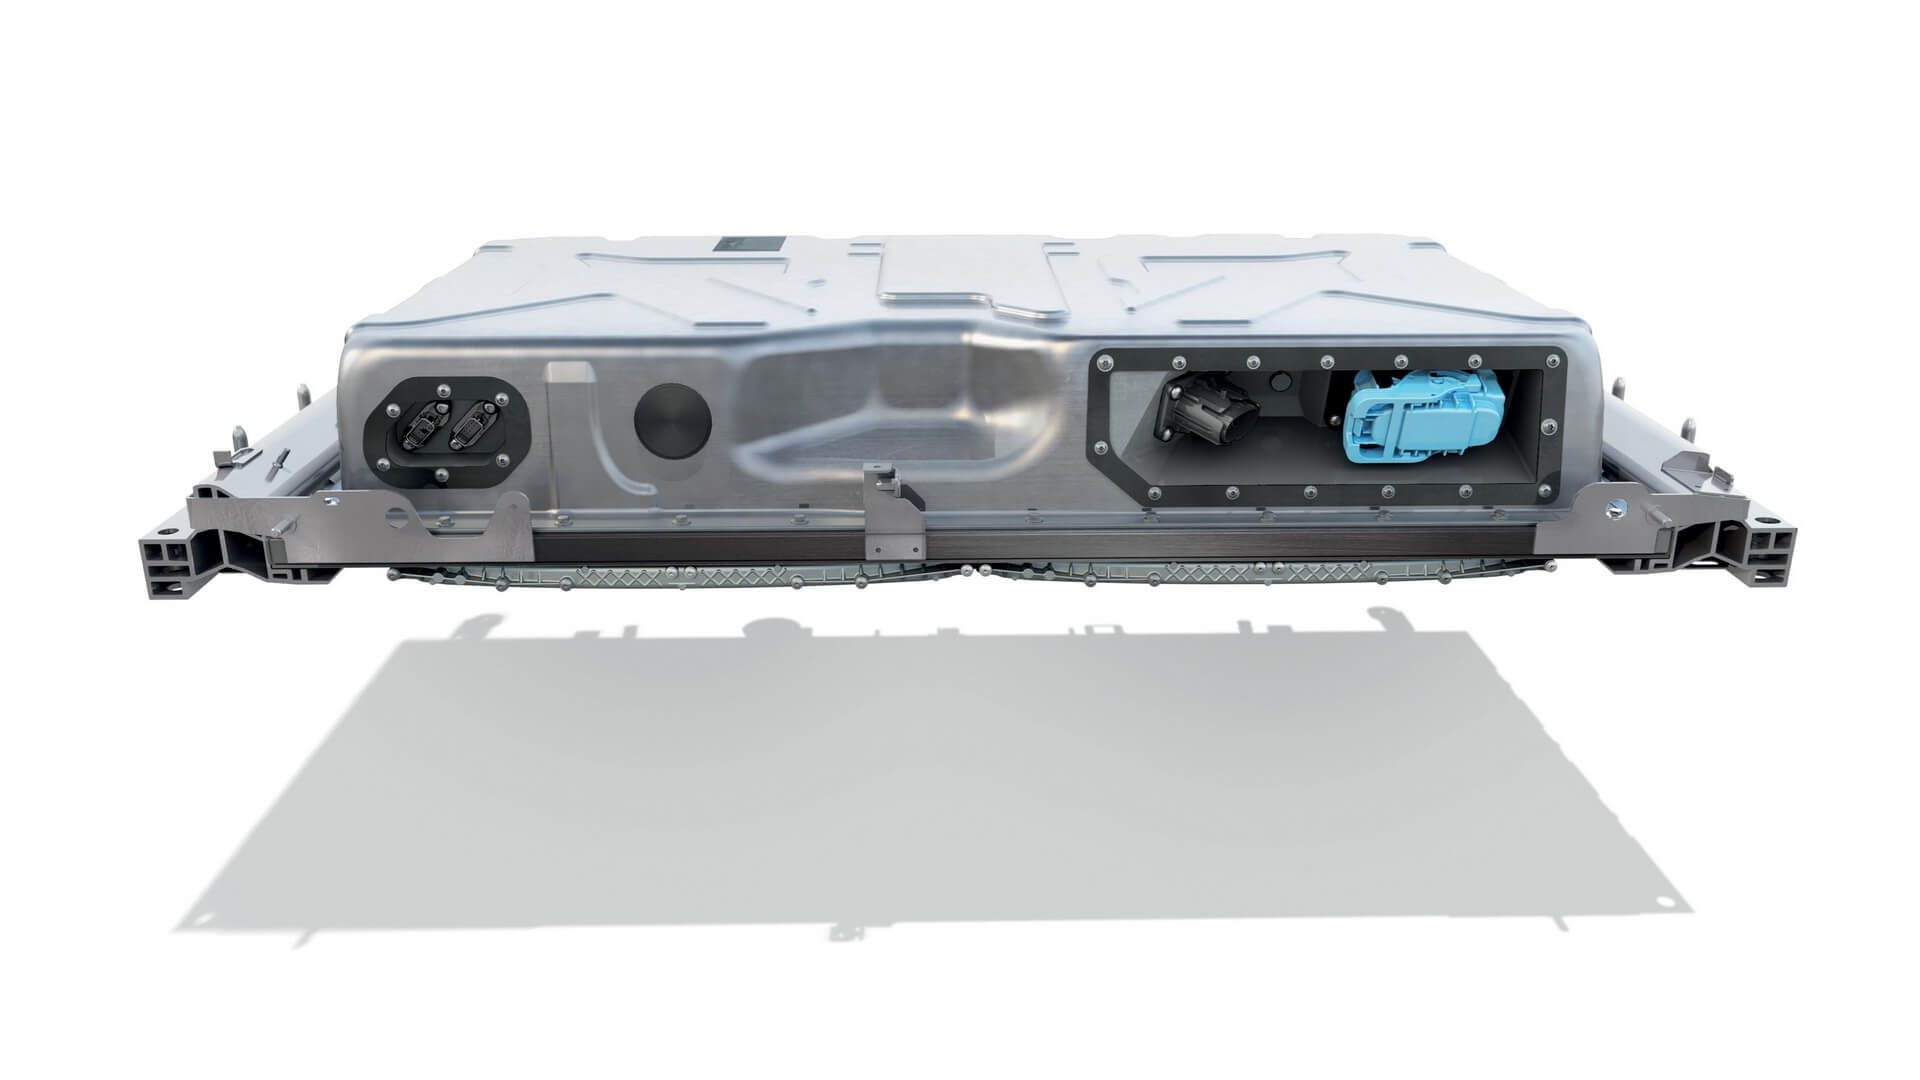 Аккумуляторная батарея от LG Chem с жидкостным охлаждением